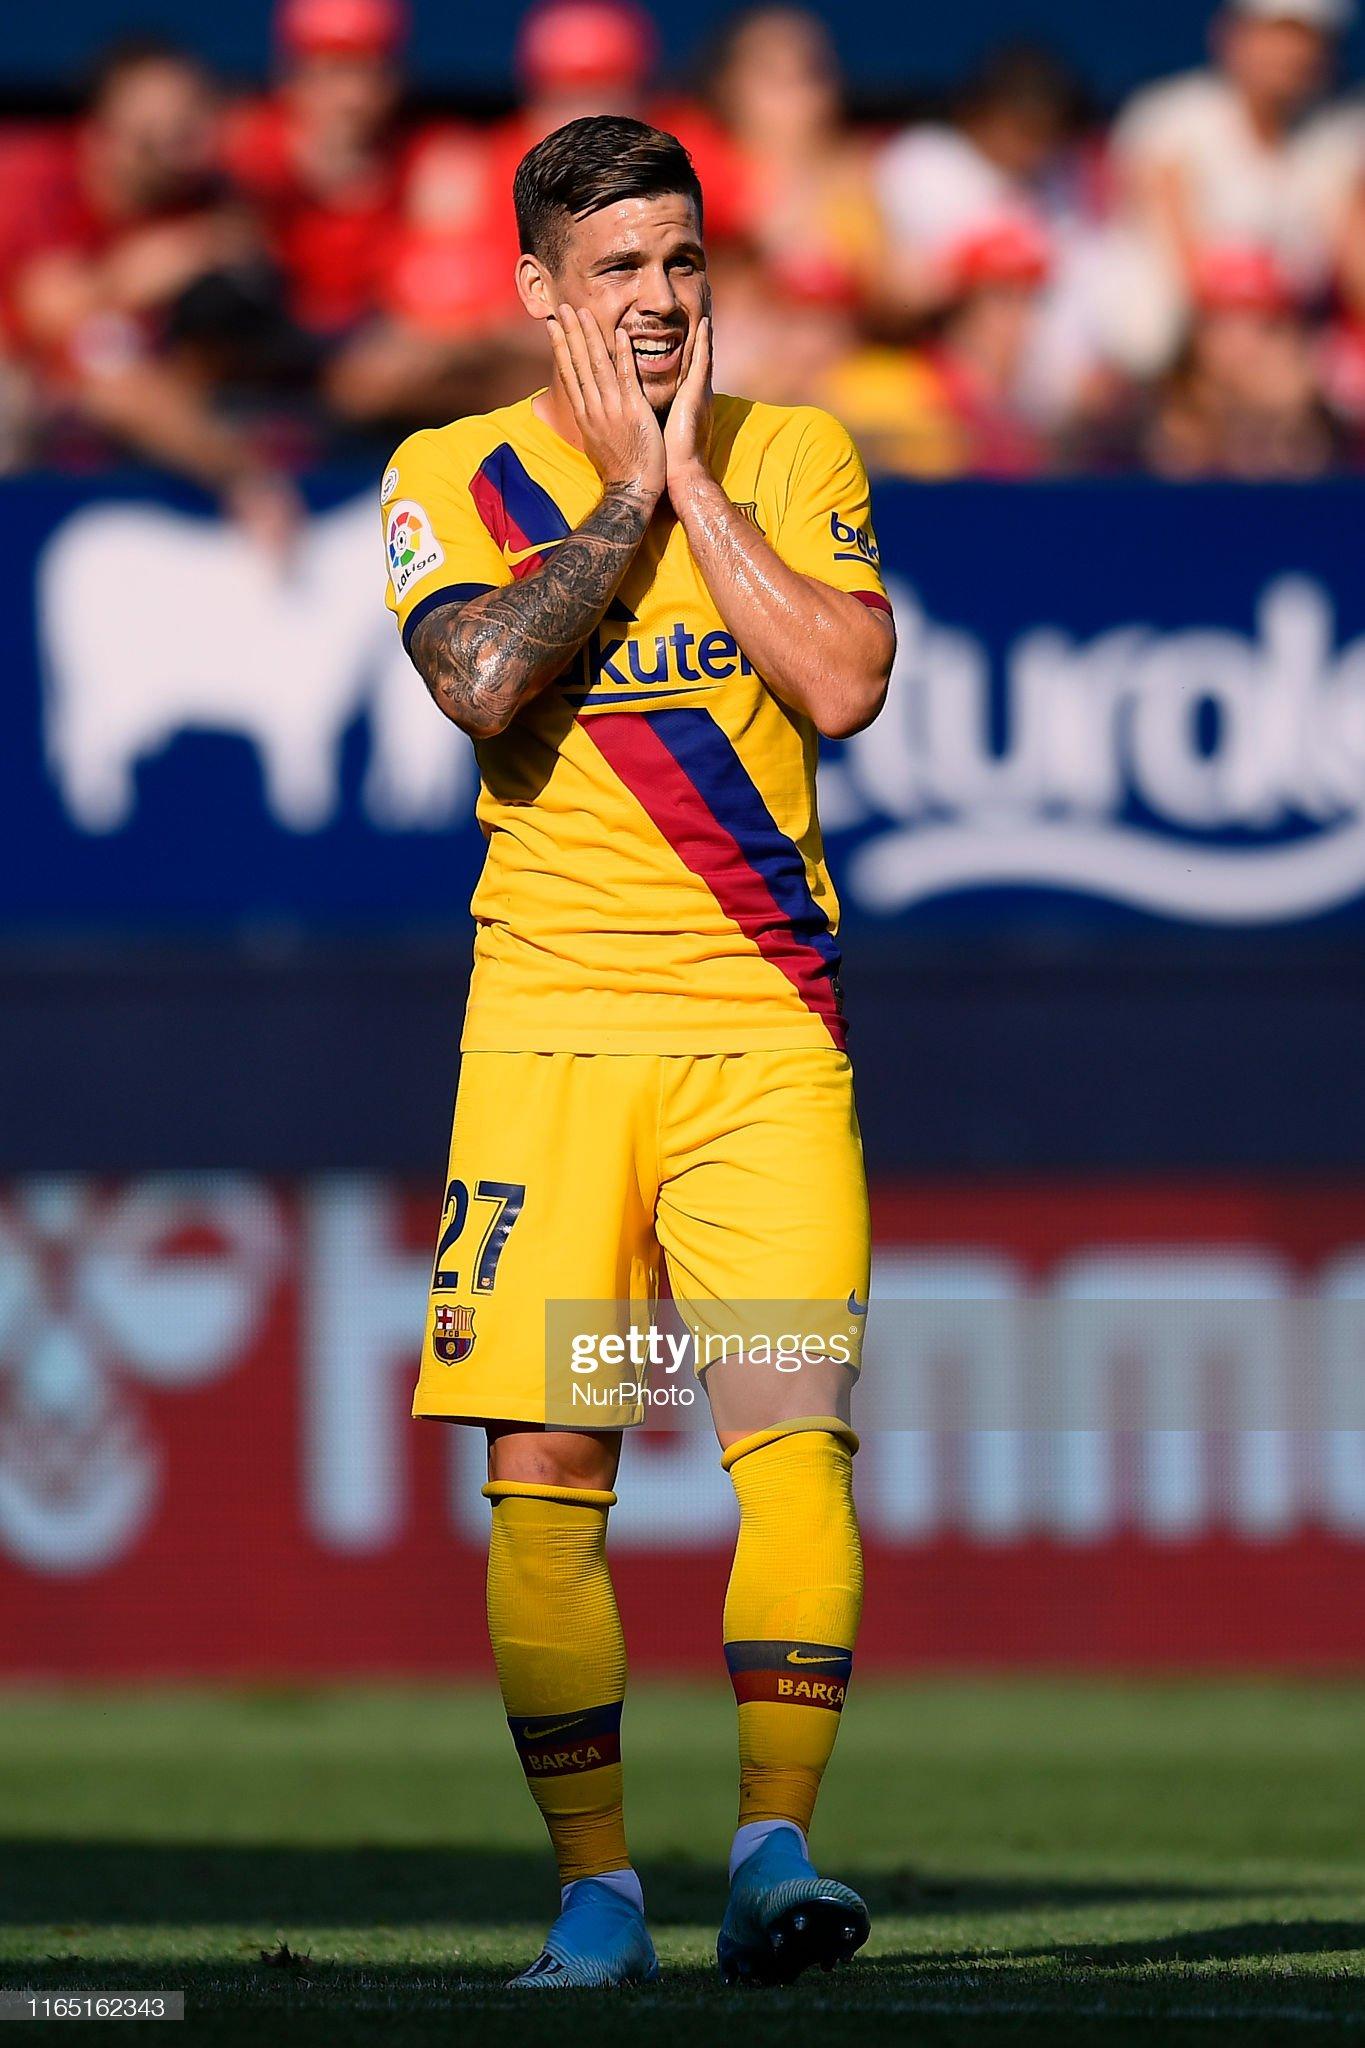 صور مباراة : أوساسونا - برشلونة 2-2 ( 31-08-2019 )  Carles-perez-of-barcelona-lament-a-failed-occasion-during-the-liga-picture-id1165162343?s=2048x2048